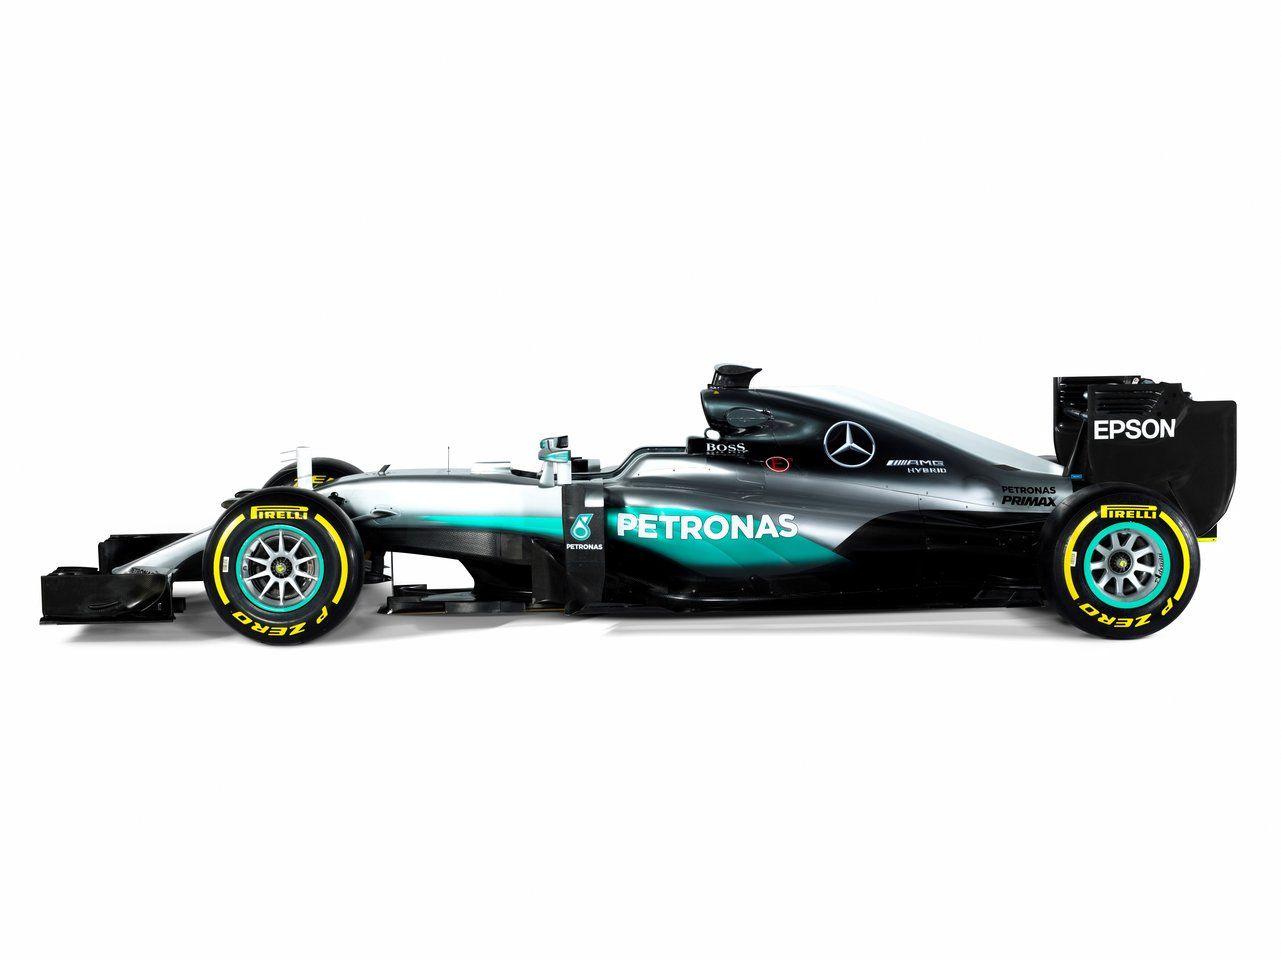 F1 W07 Hybrid Mercedes Amg Mercedes Benz Classic Mercedes [ 960 x 1281 Pixel ]